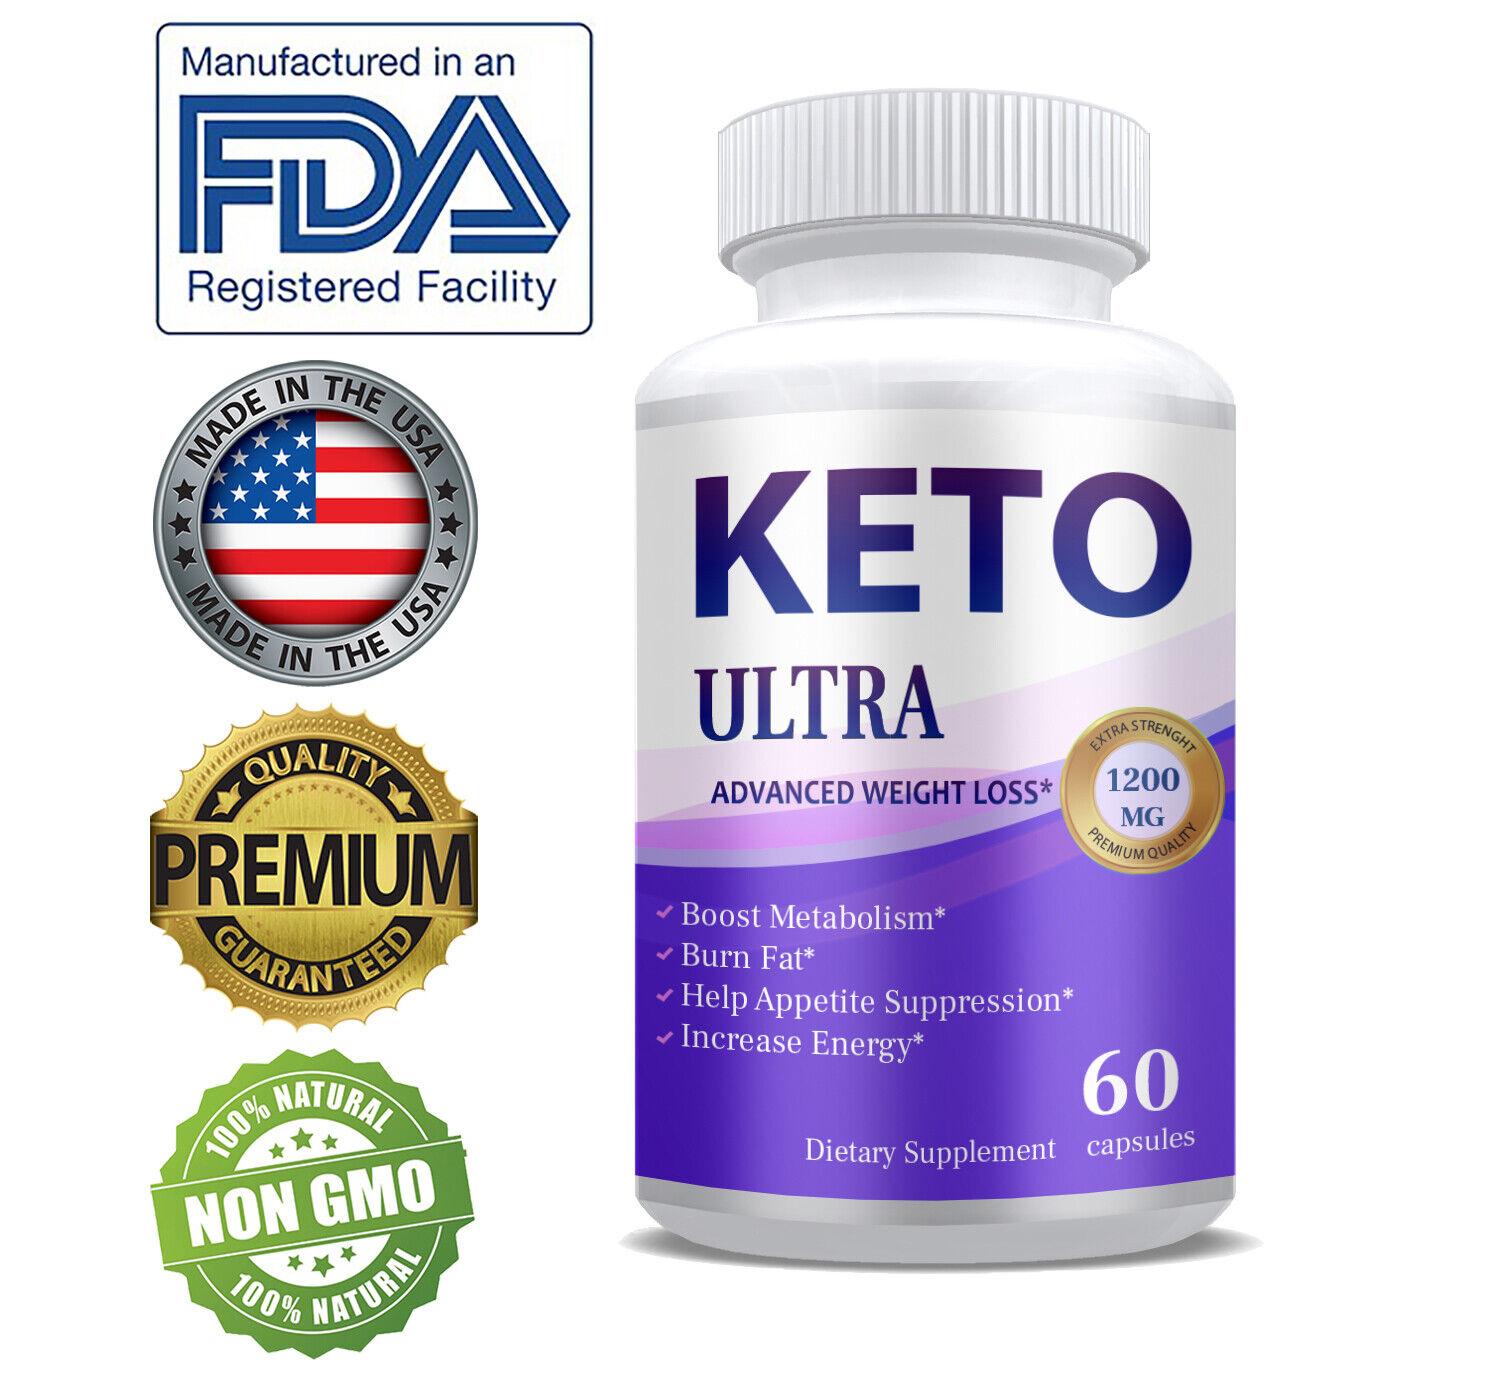 Shark Tank Keto Diet Pills Supplements 1200MG Fat Burner Fas